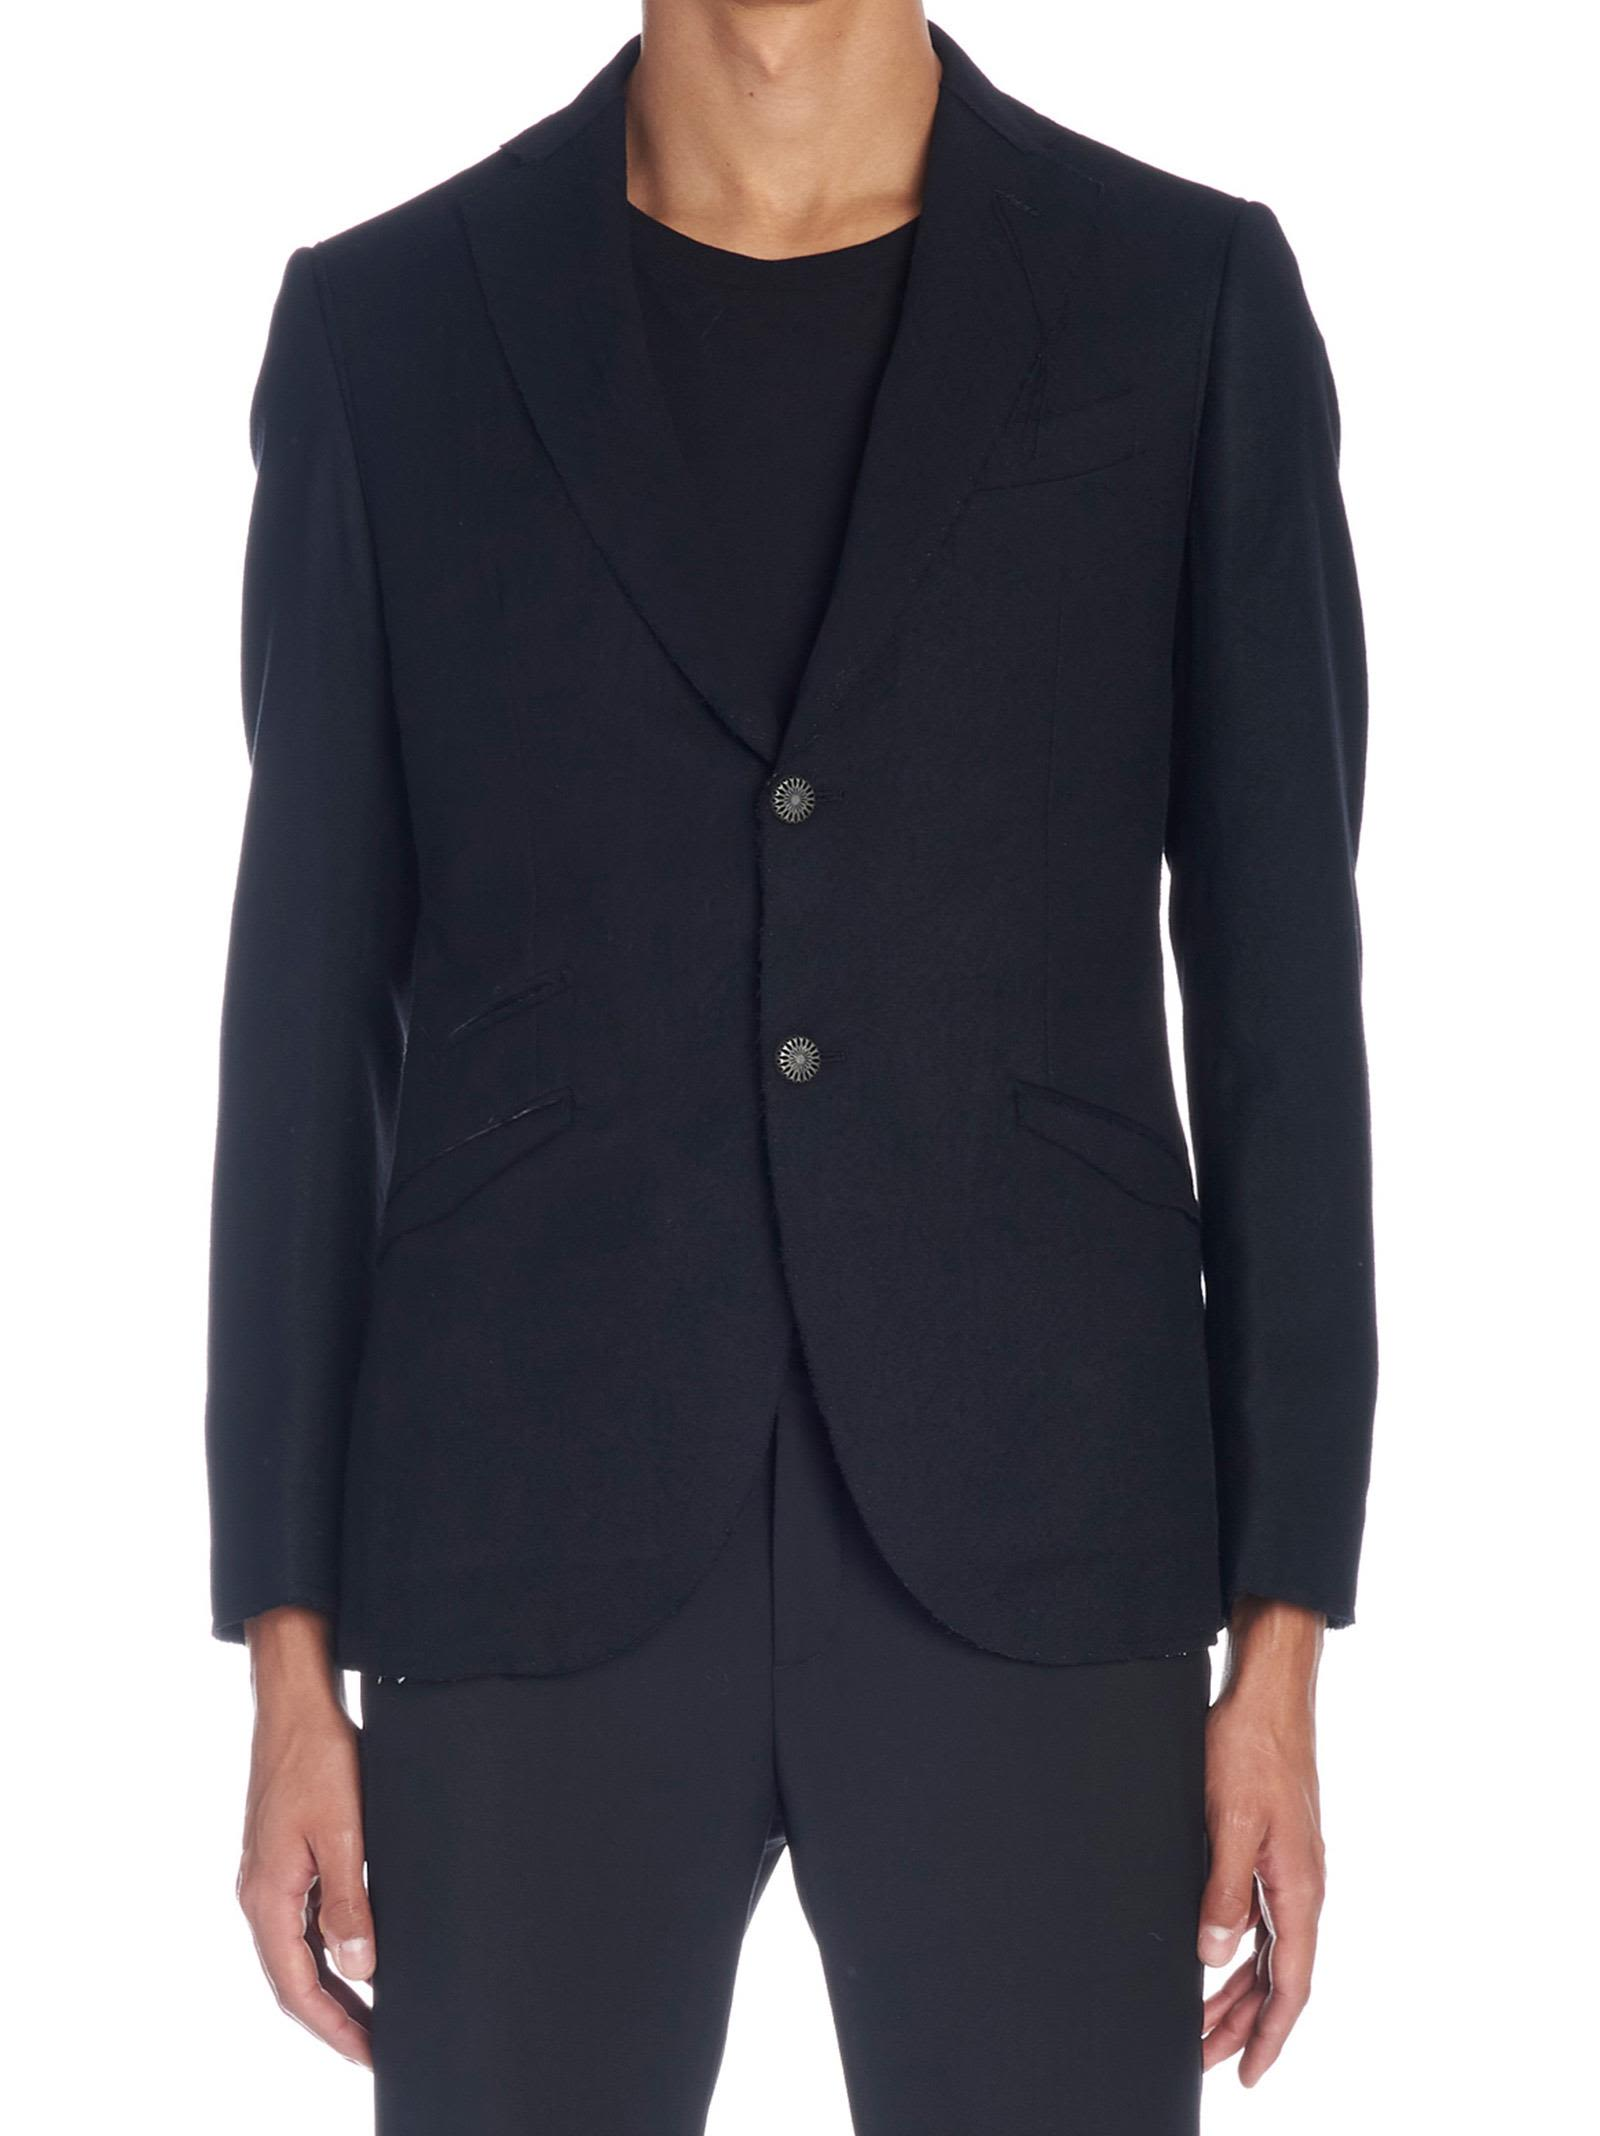 MAURIZIO MIRI 'Vega' Jacket in Black